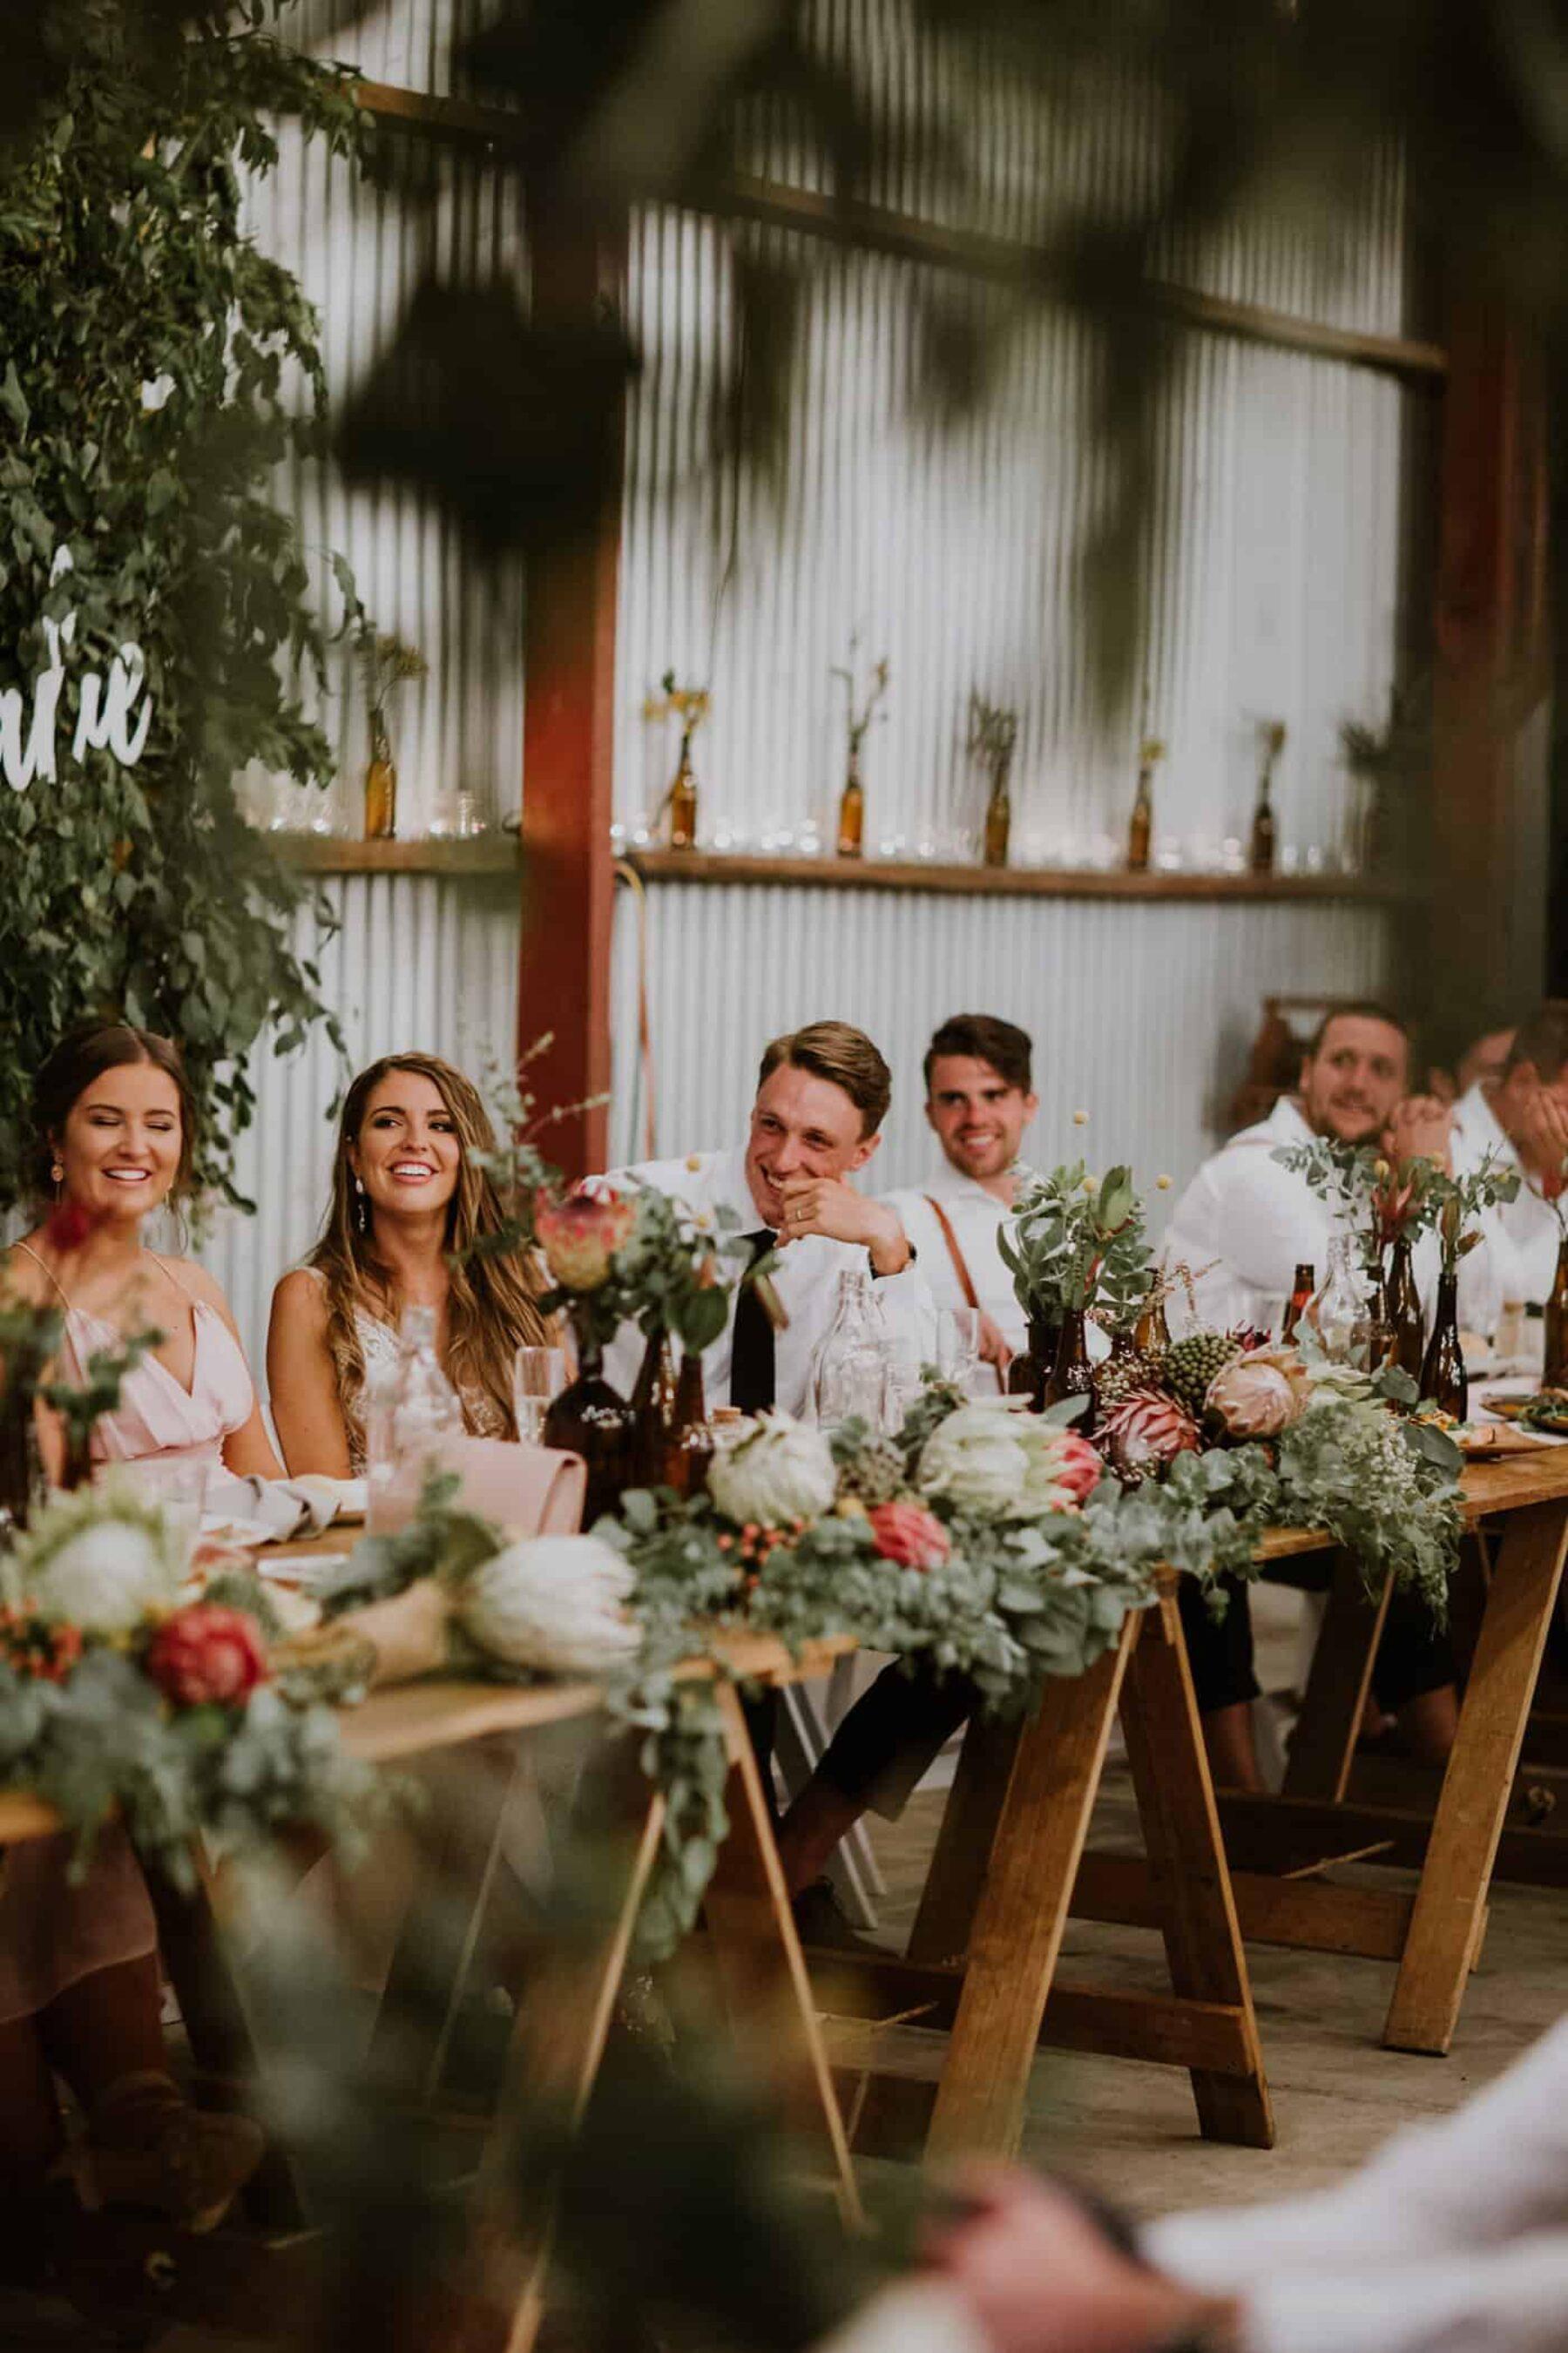 Yarra Valley farm wedding with epic DIY florals / Elsa Campbell Photography